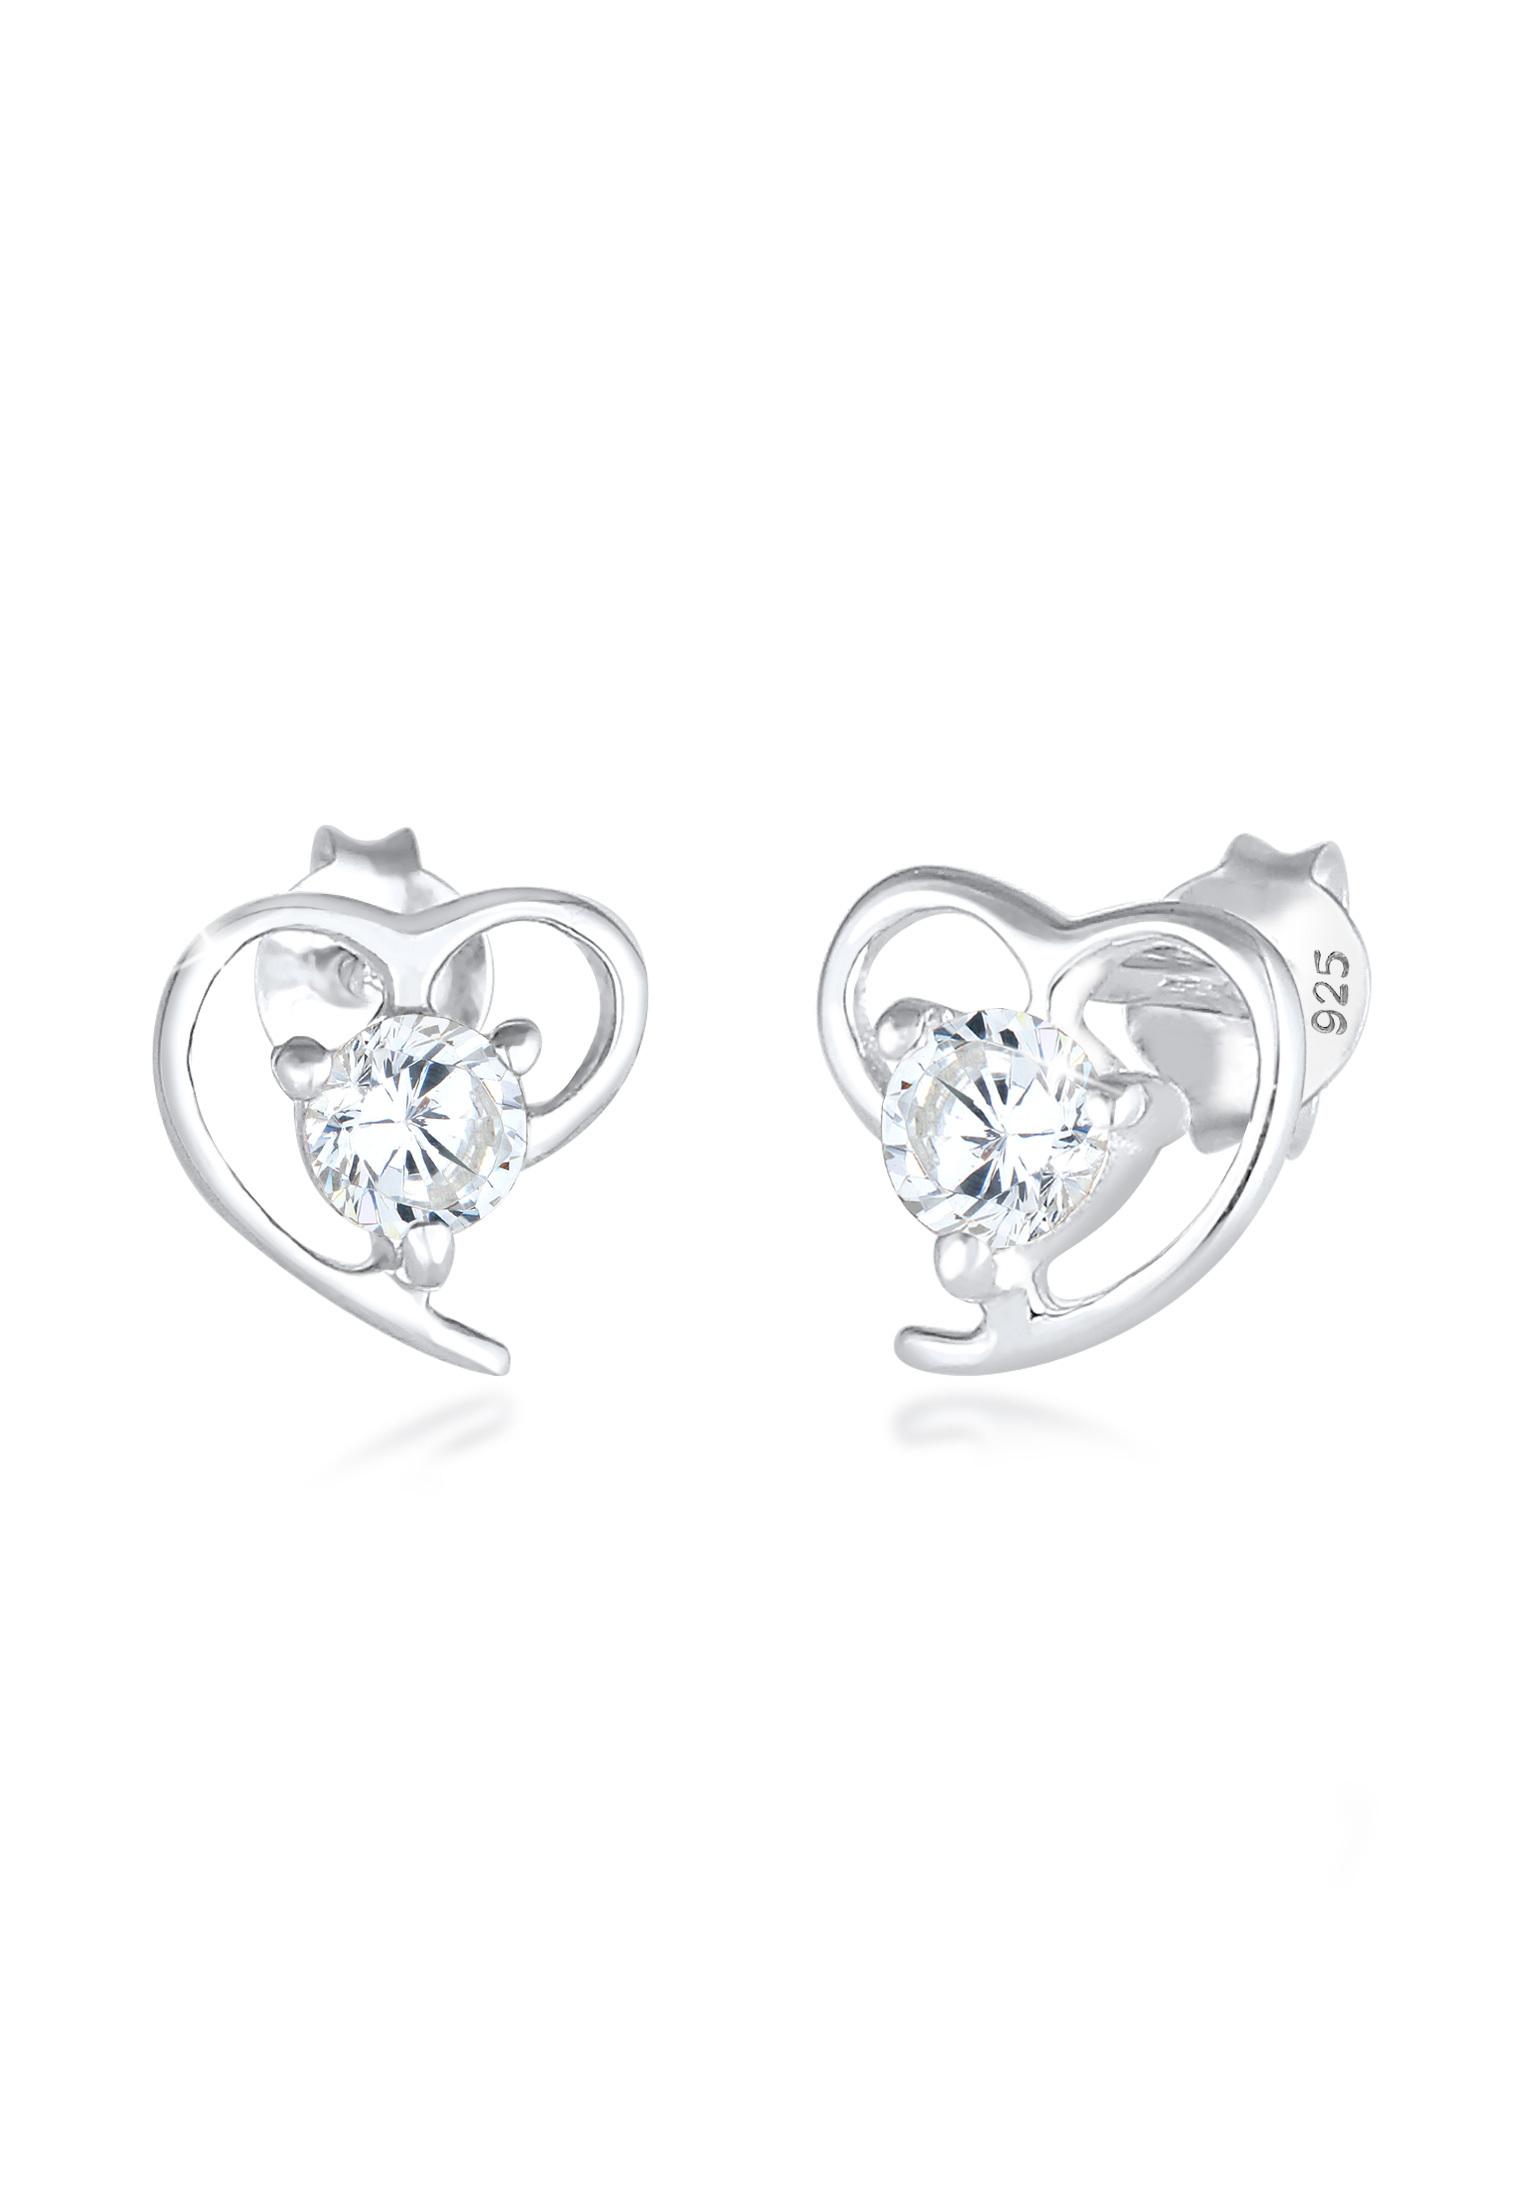 Ohrstecker Herz | Zirkonia ( Weiß ) | 925er Sterling Silber